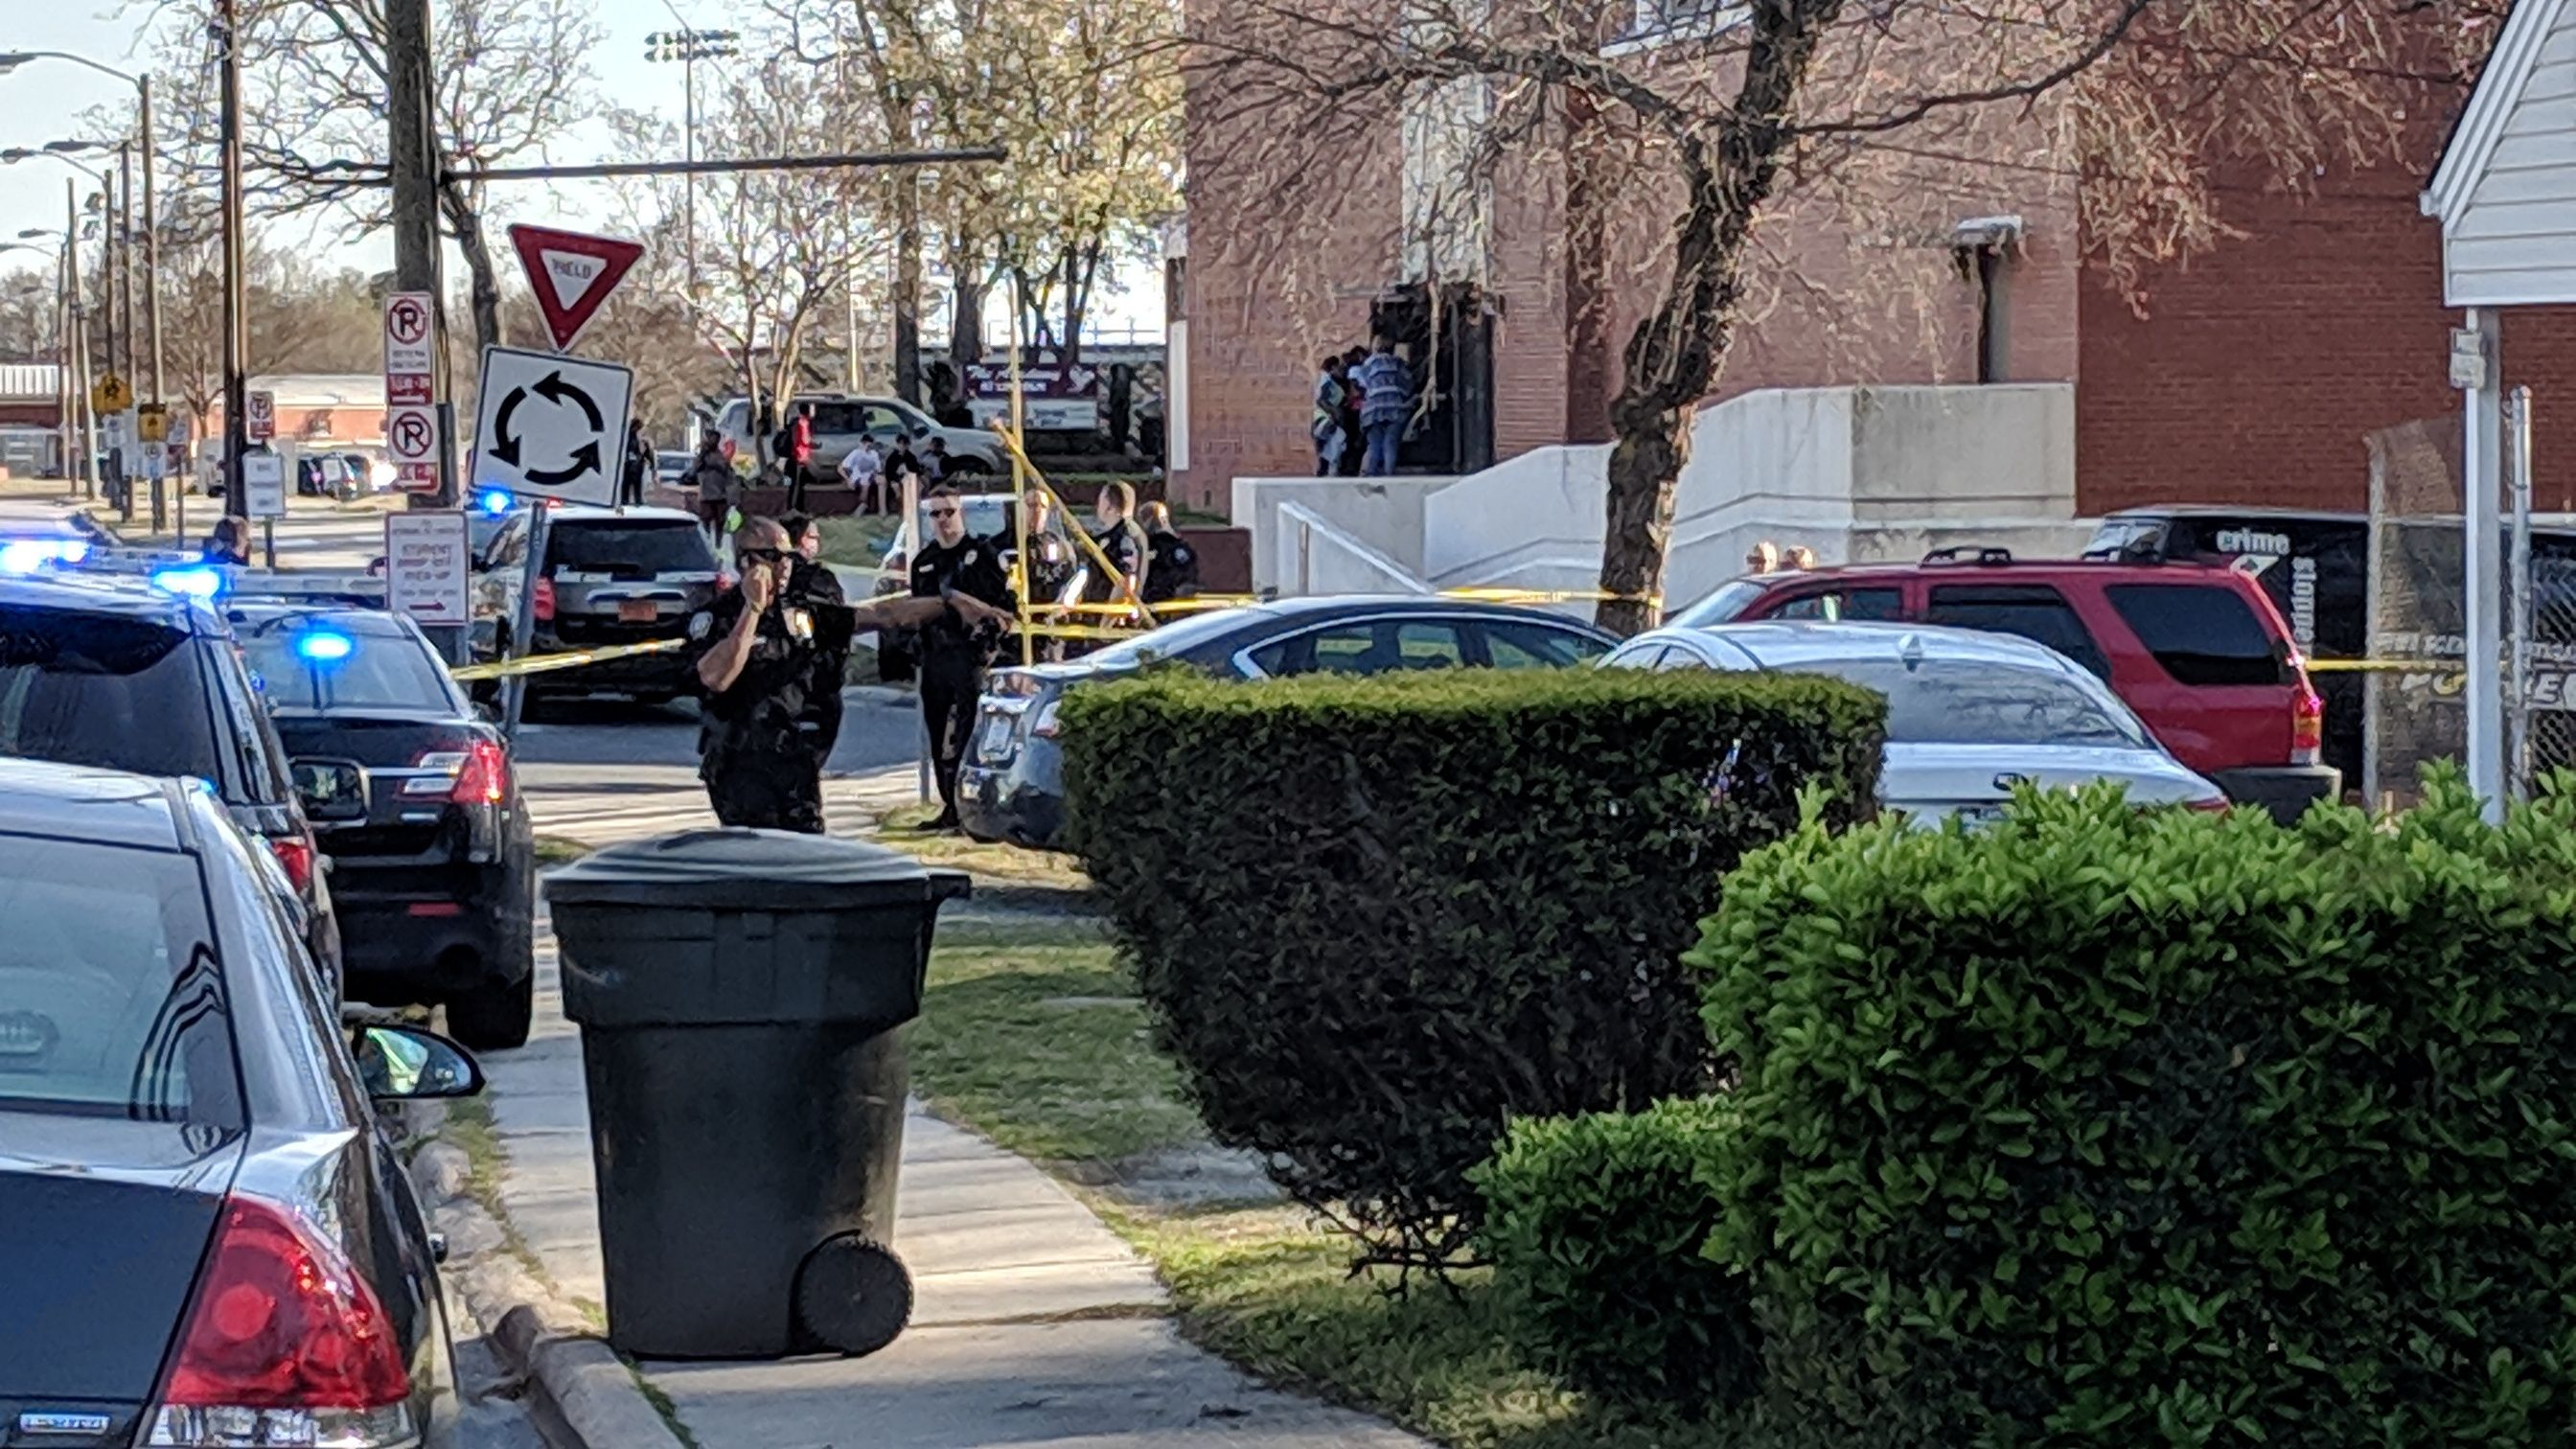 Shooting victim found near Dudley High School in Greensboro